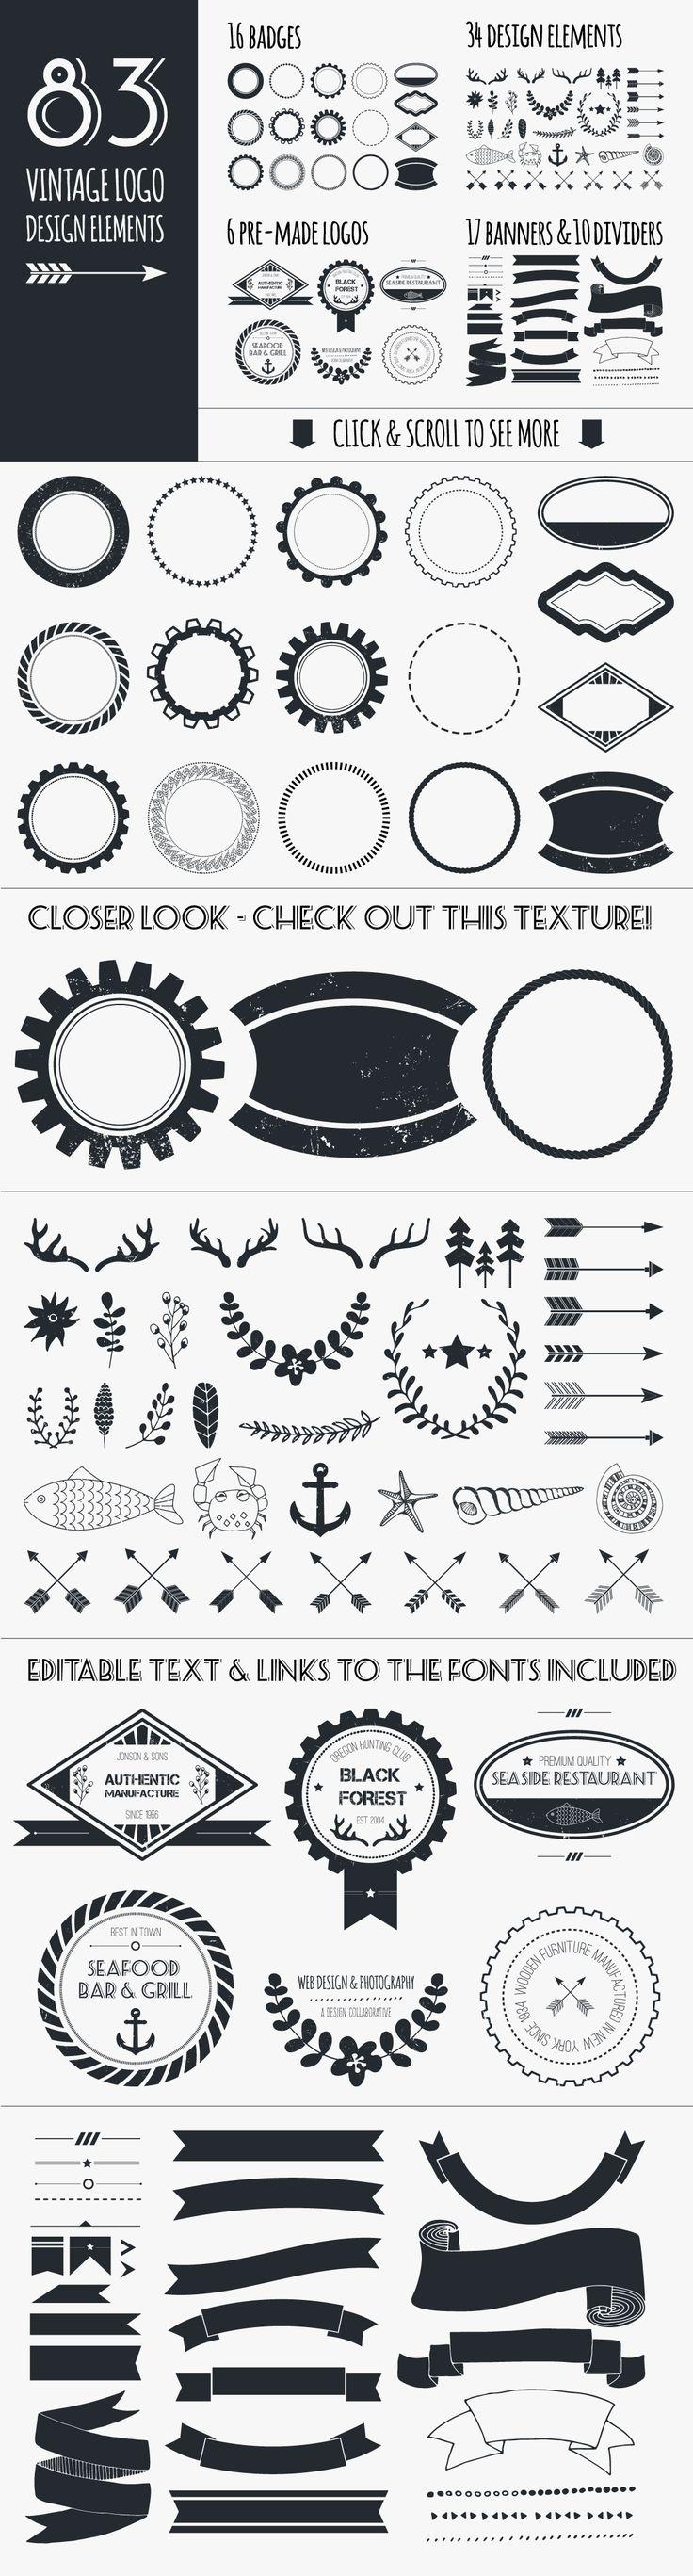 Vintage Logo Elements Bundle by Favete Art on Creative Market